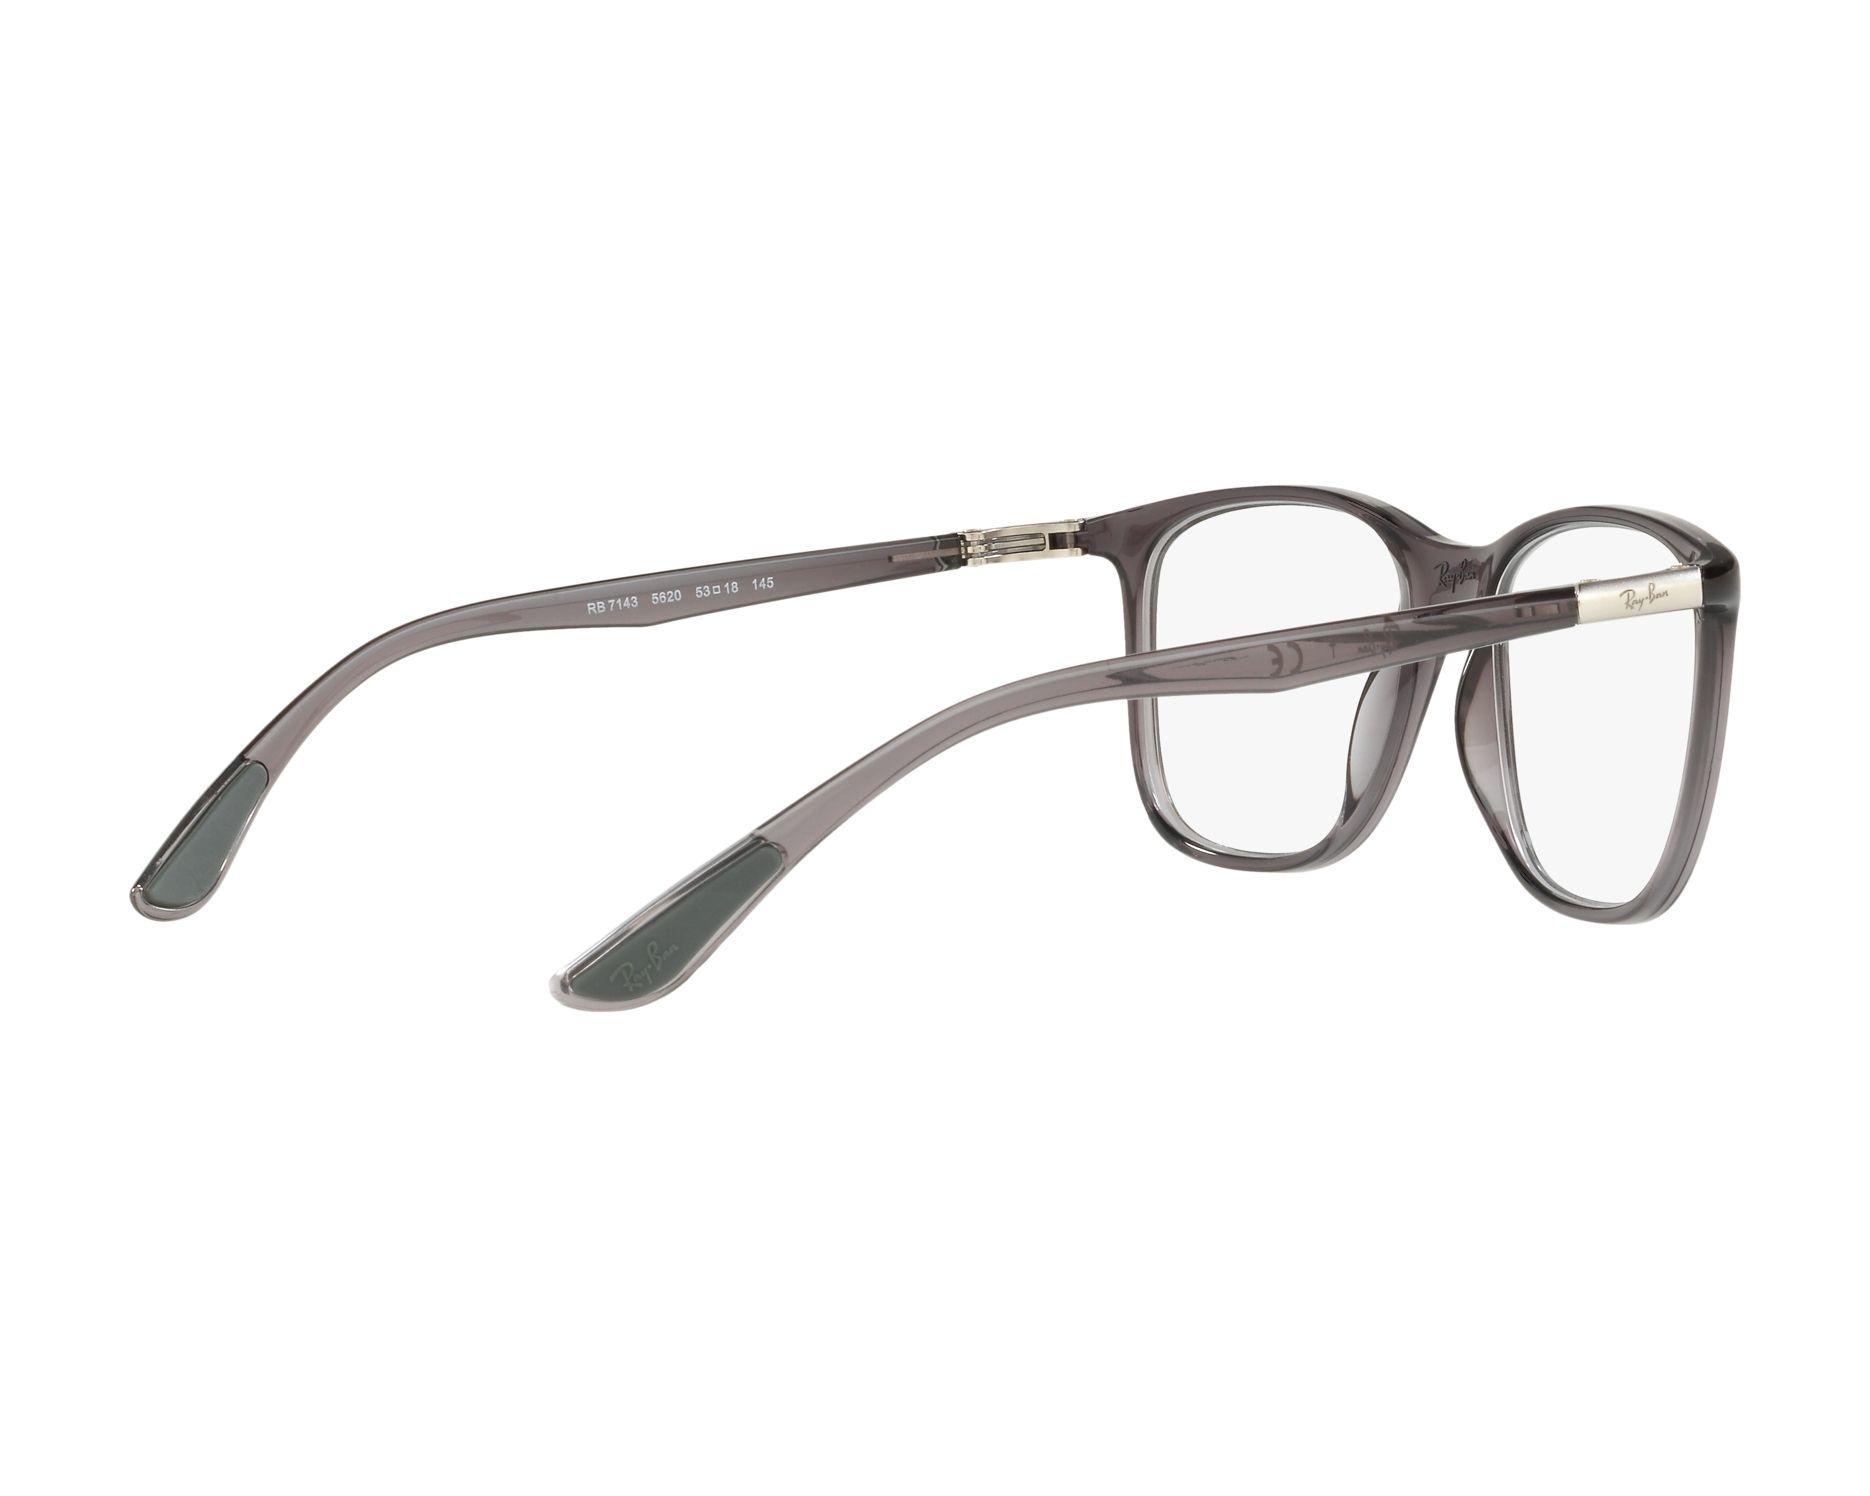 621cbae8fa eyeglasses Ray-Ban RX-7143 5620 53-18 Grey 360 degree view 9